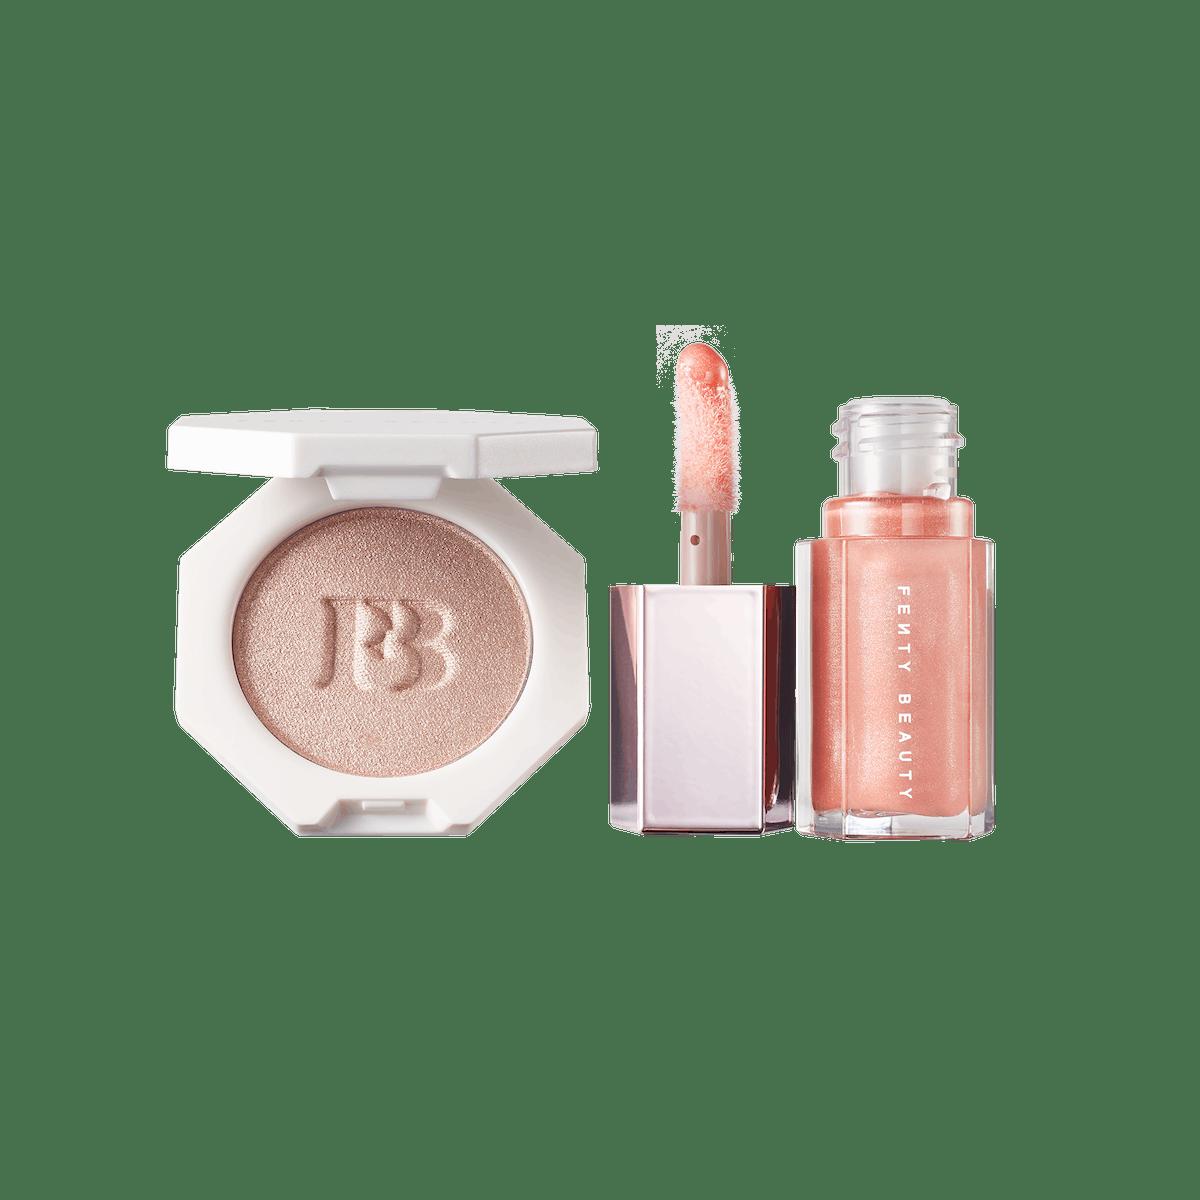 Bomb Baby 2 Mini Lip and Face Set